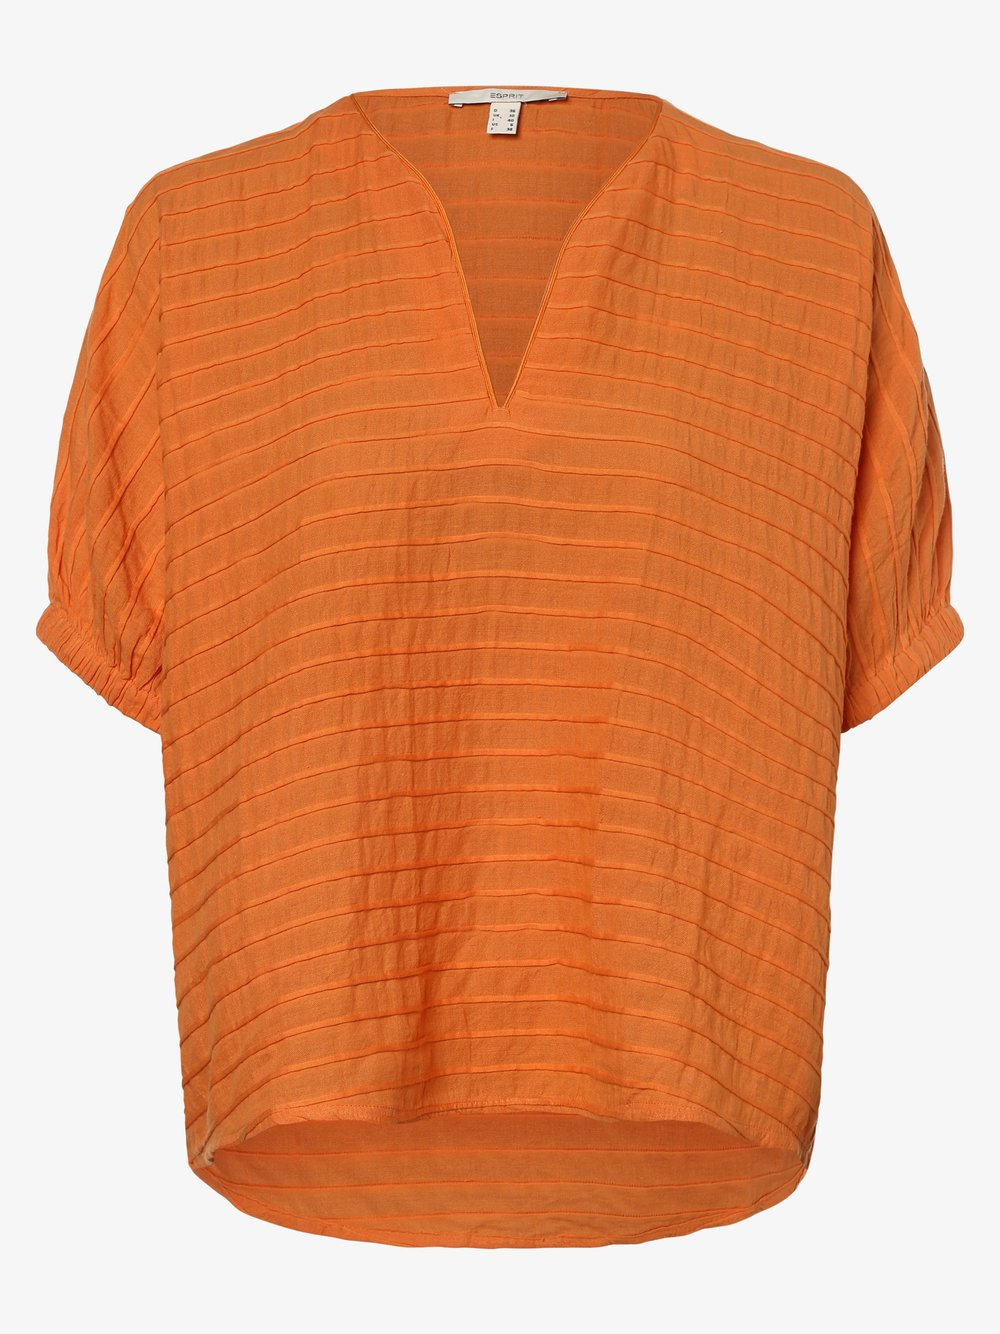 Esprit Casual – Bluzka damska, pomarańczowy Van Graaf 472028-0001-00420